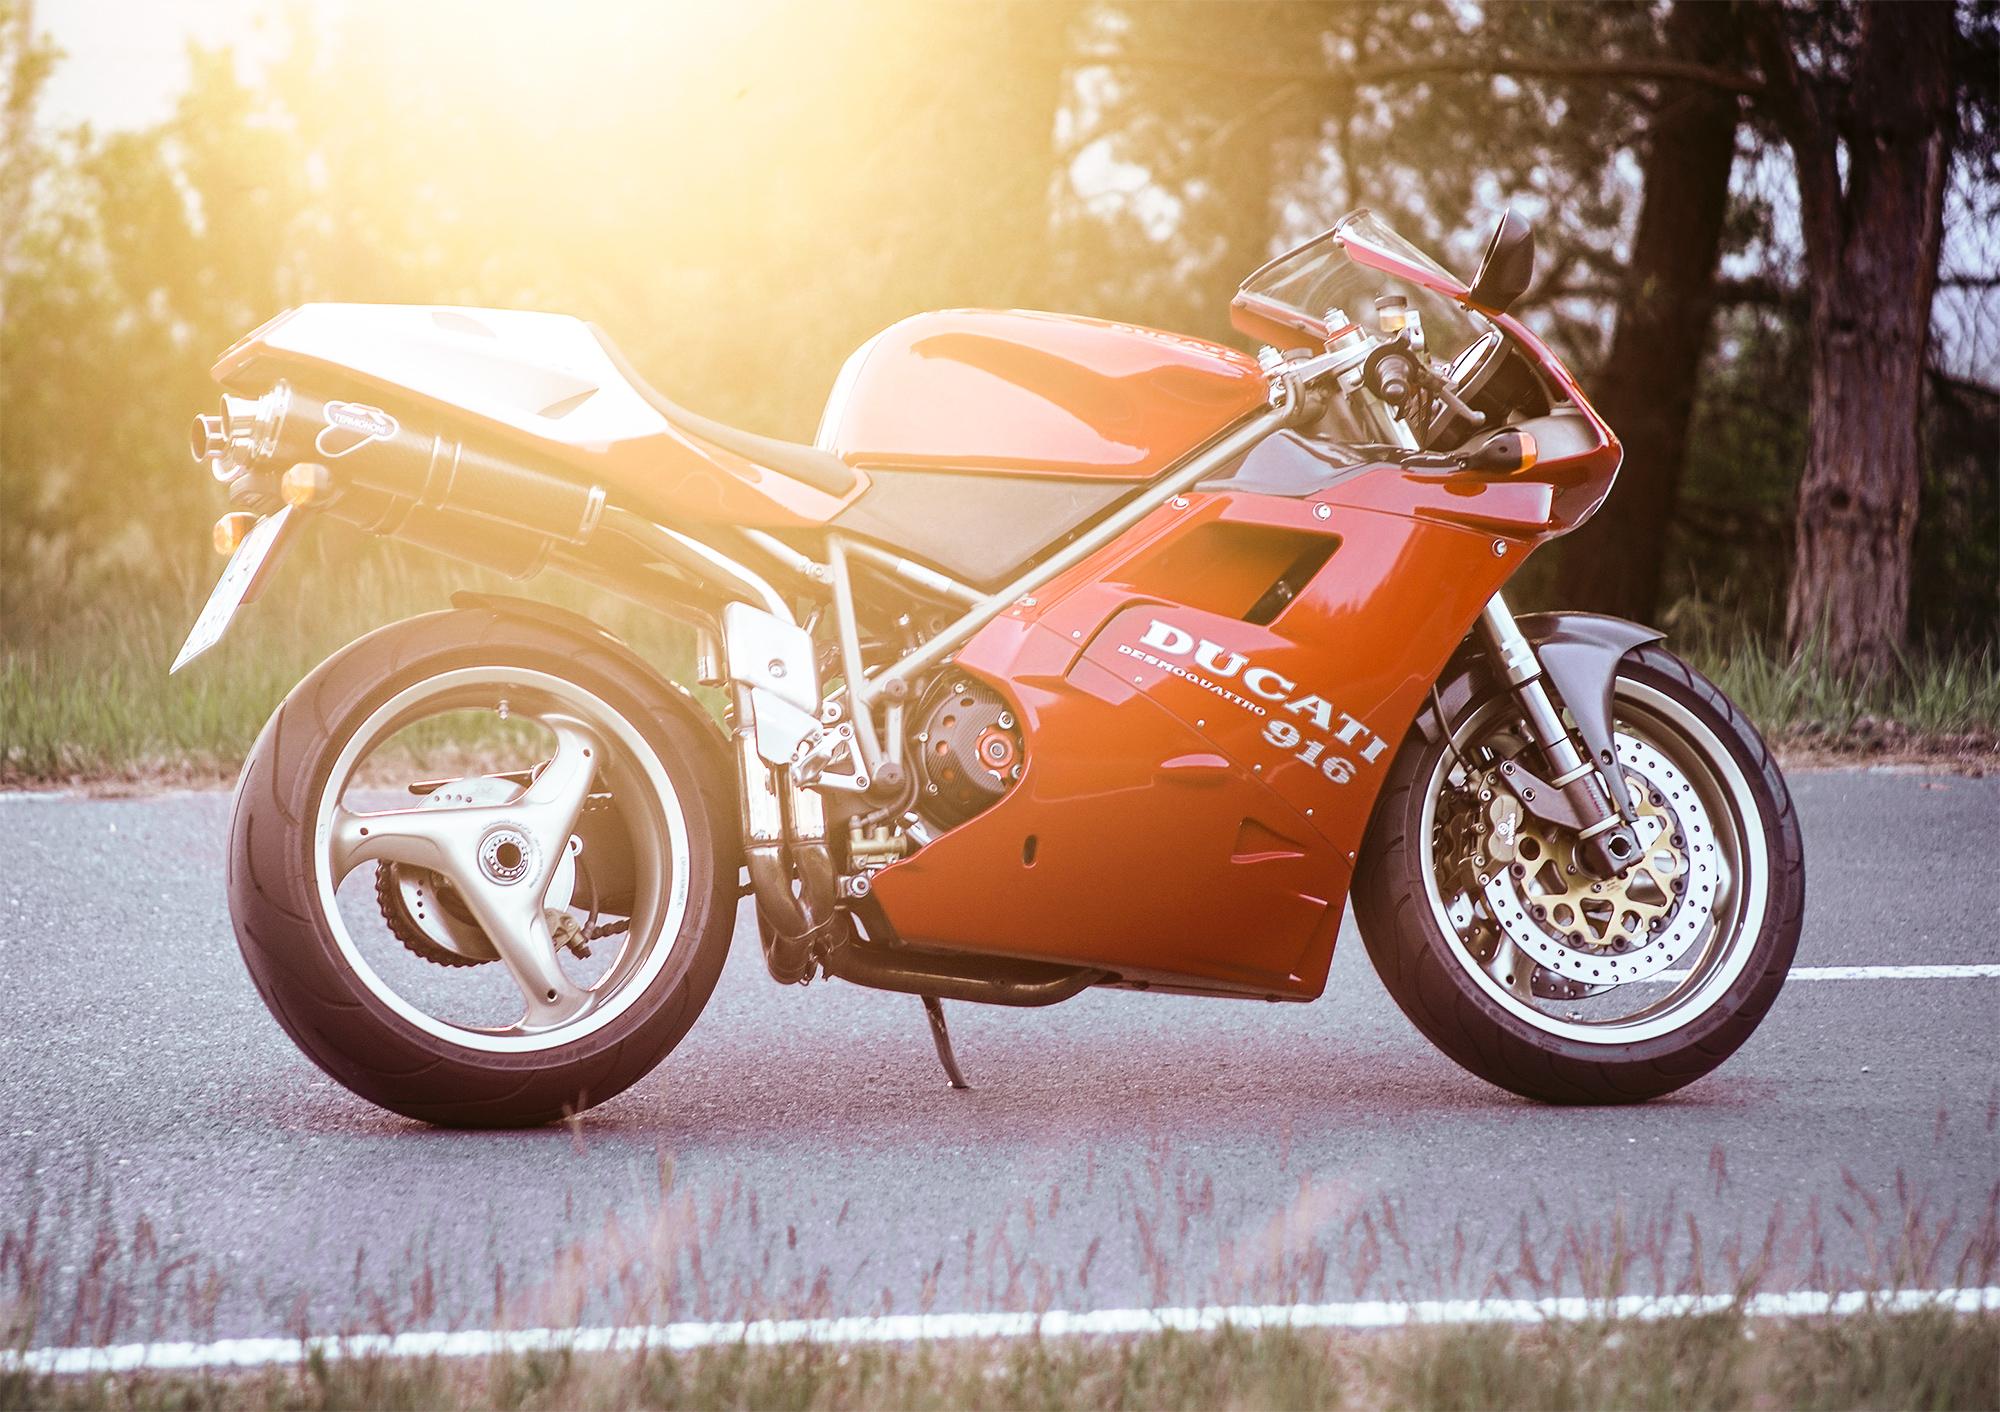 1995 Ducati 916 Strada